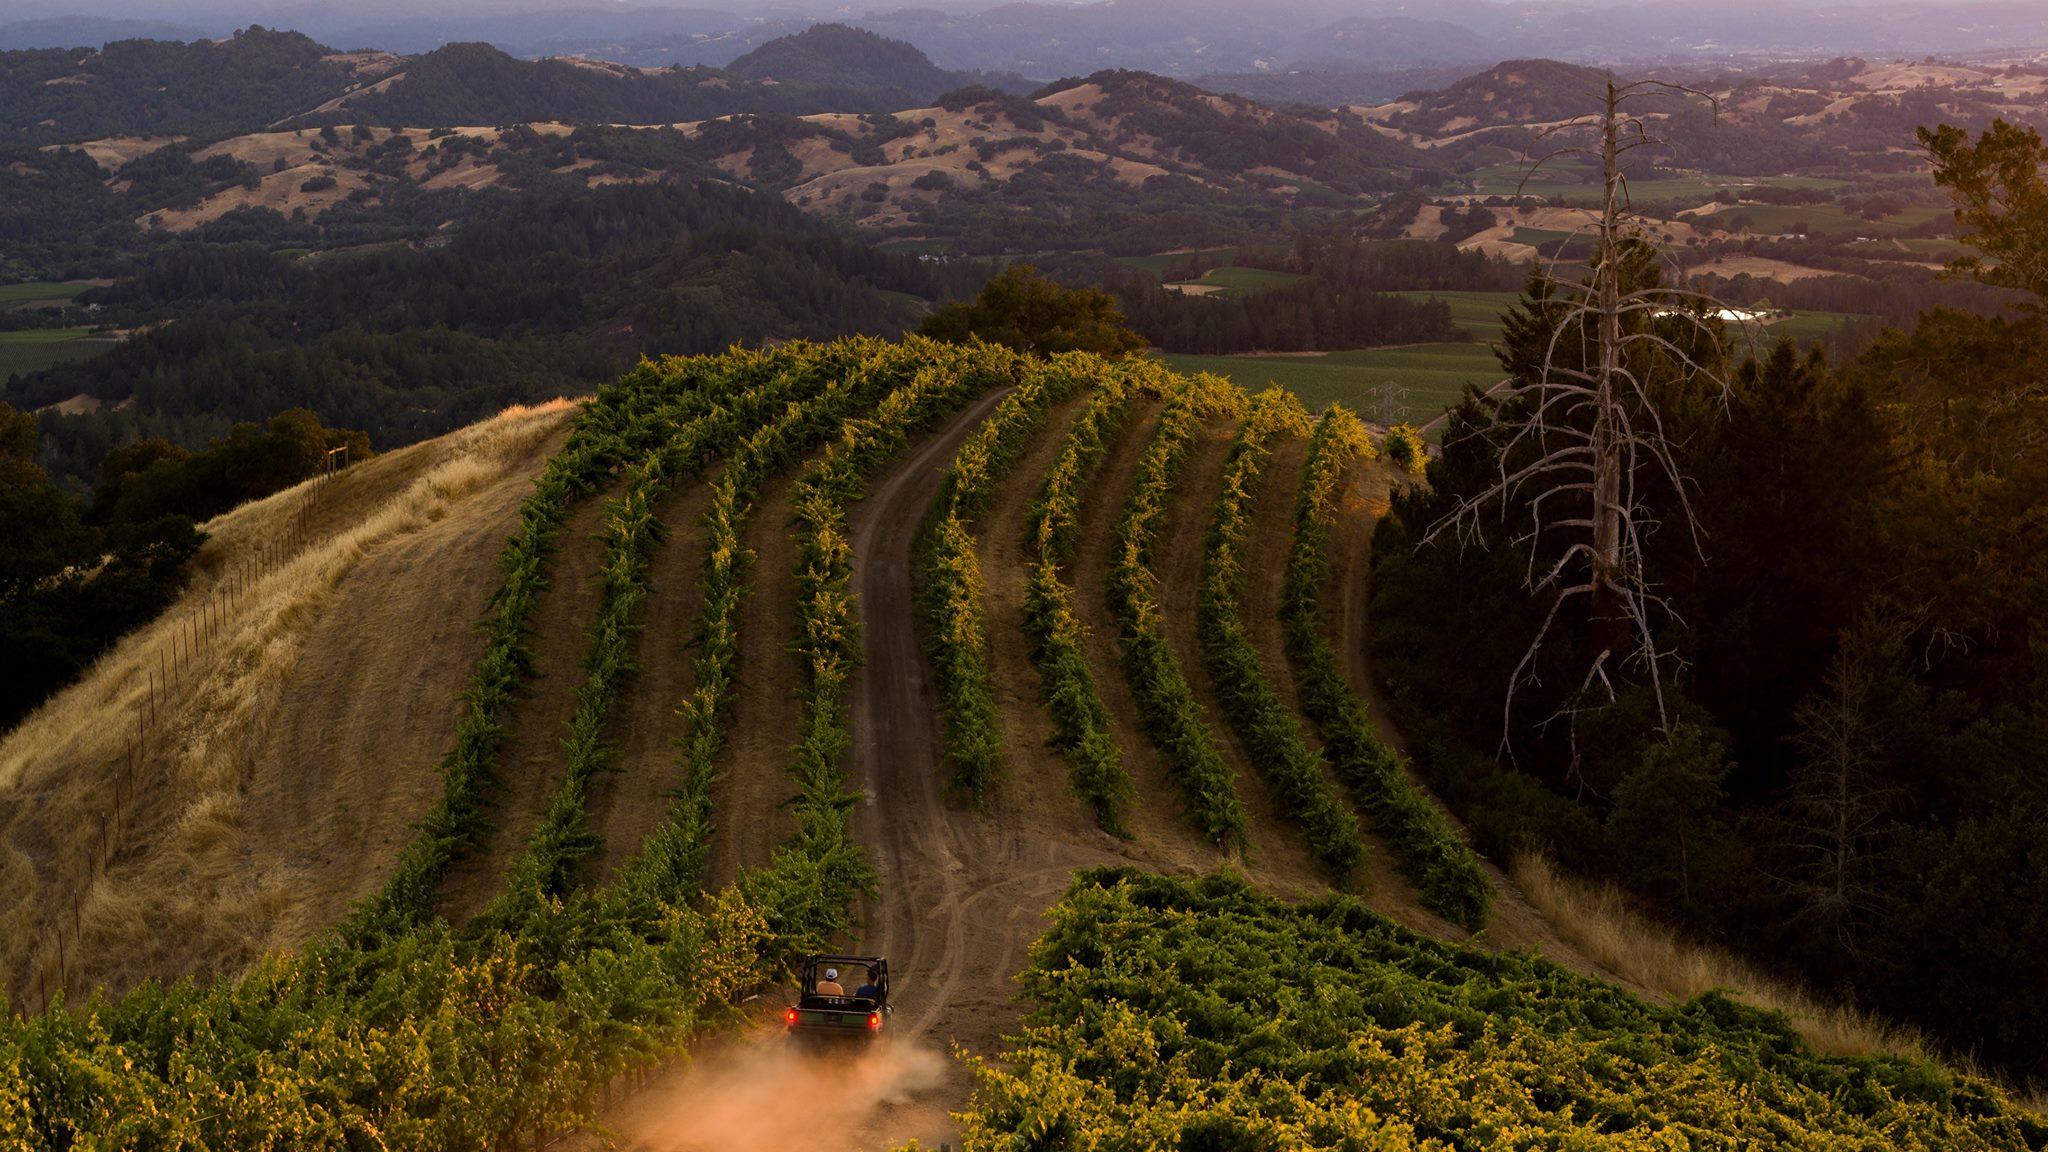 ferrari carano vineyards and winery certified california sustainable winegrowing002.jpg